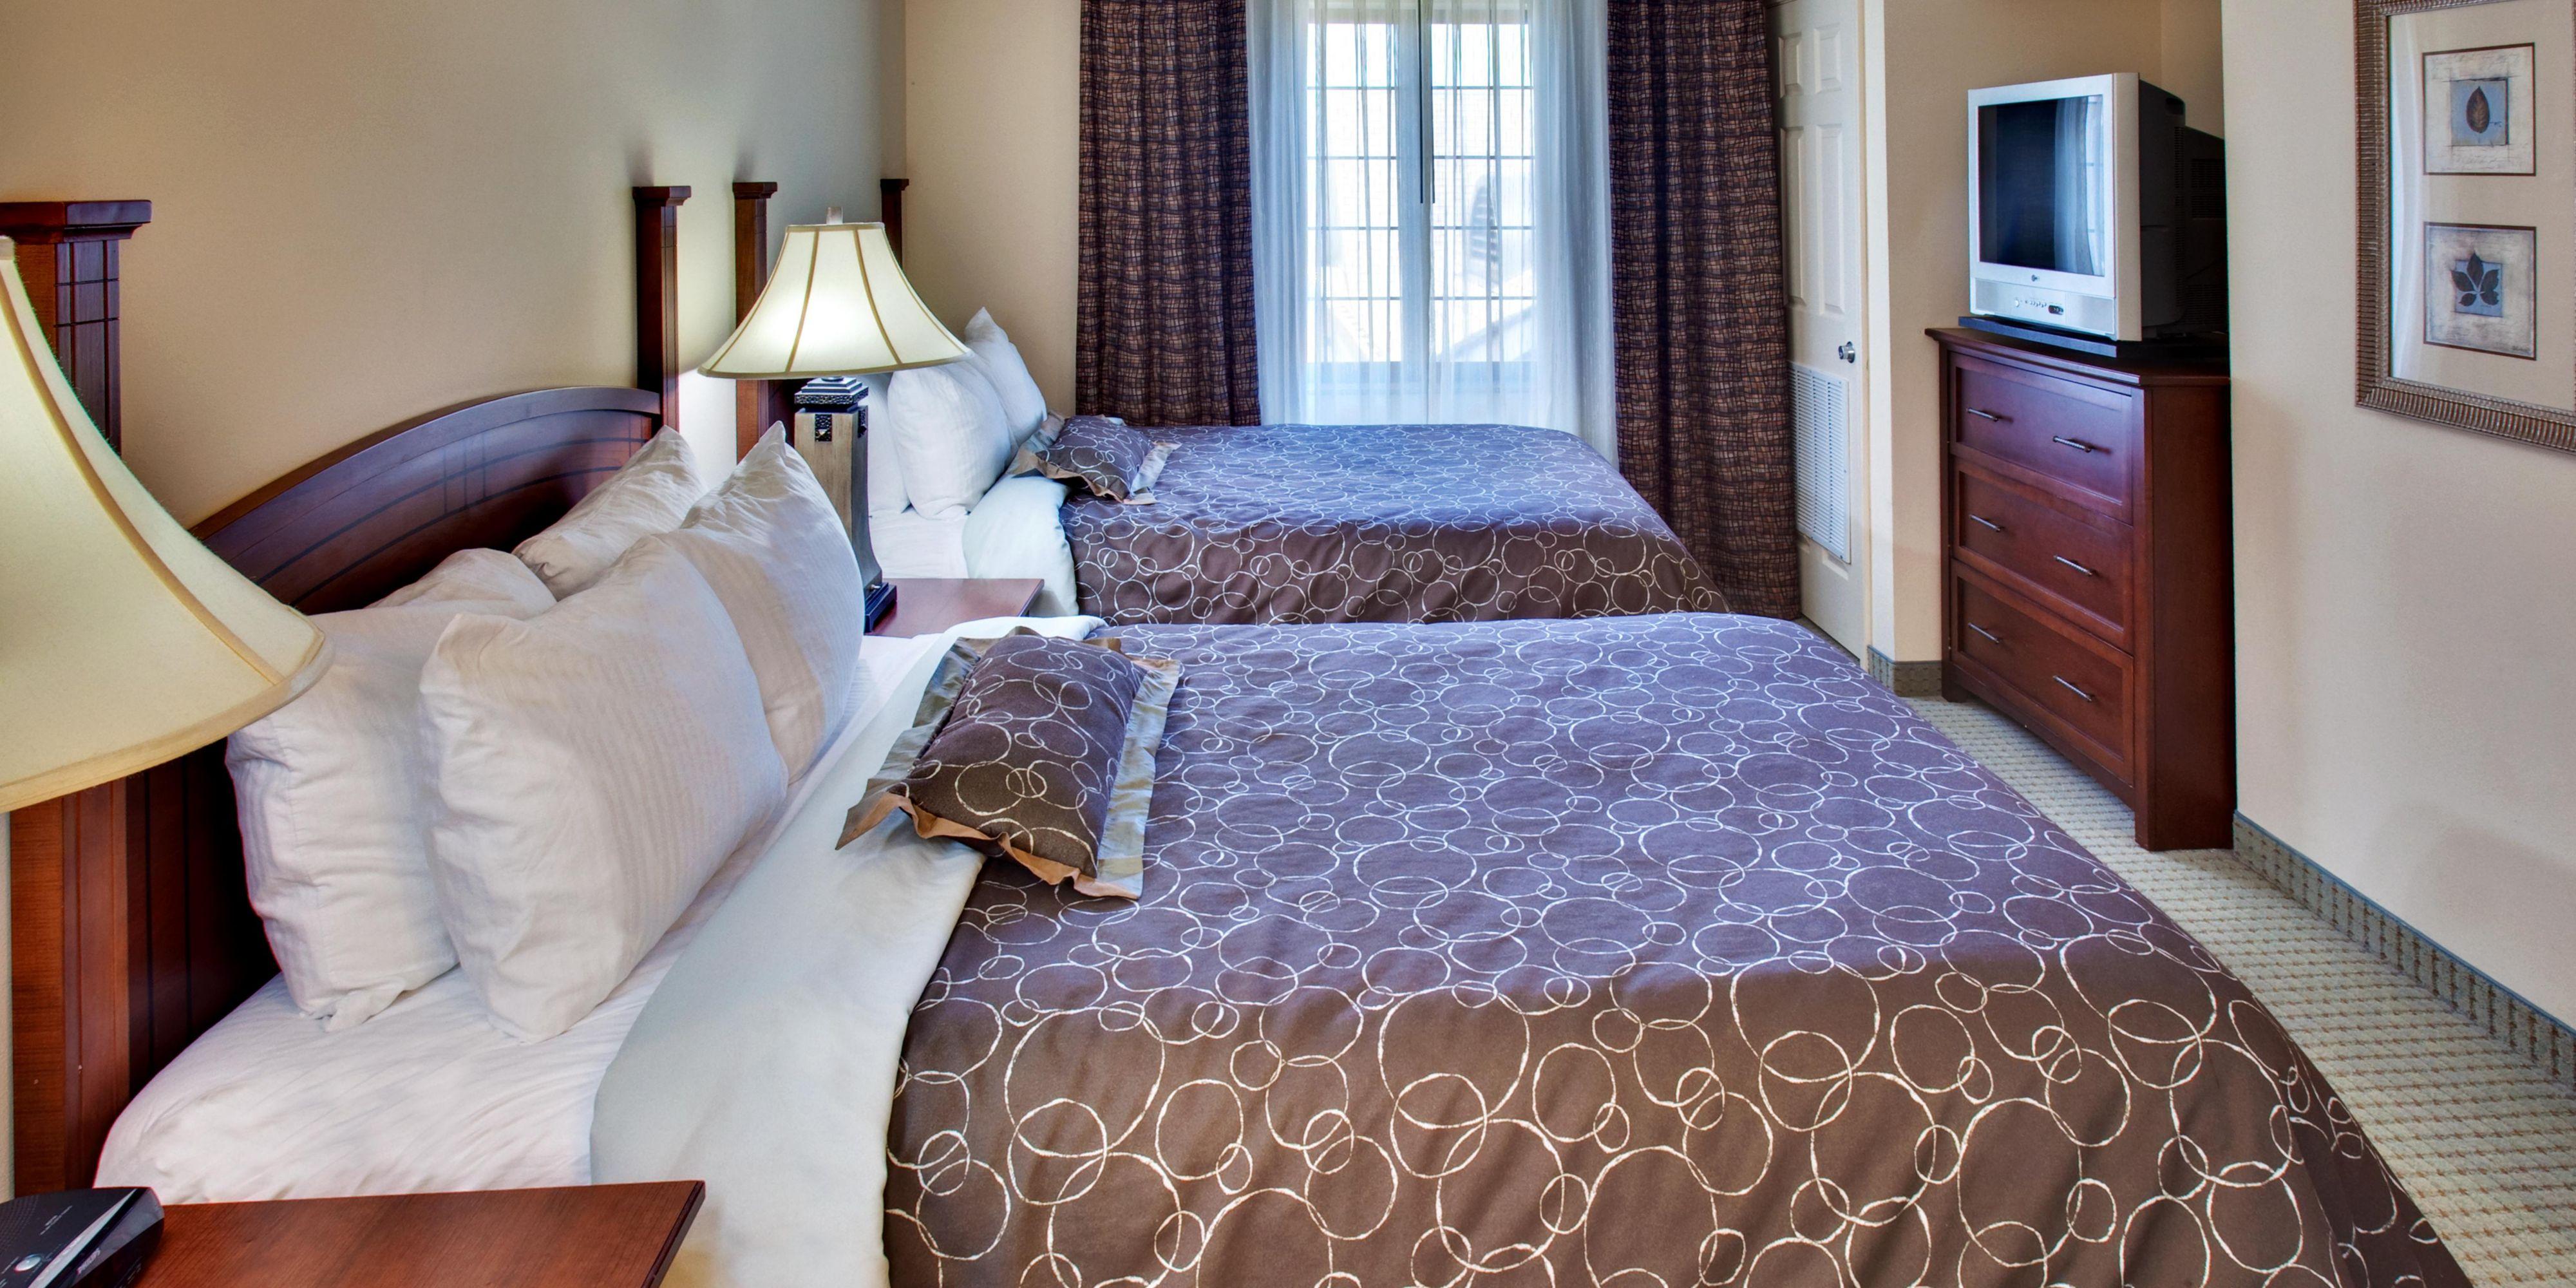 Bed Bath And Beyond Davenport Ia Hours